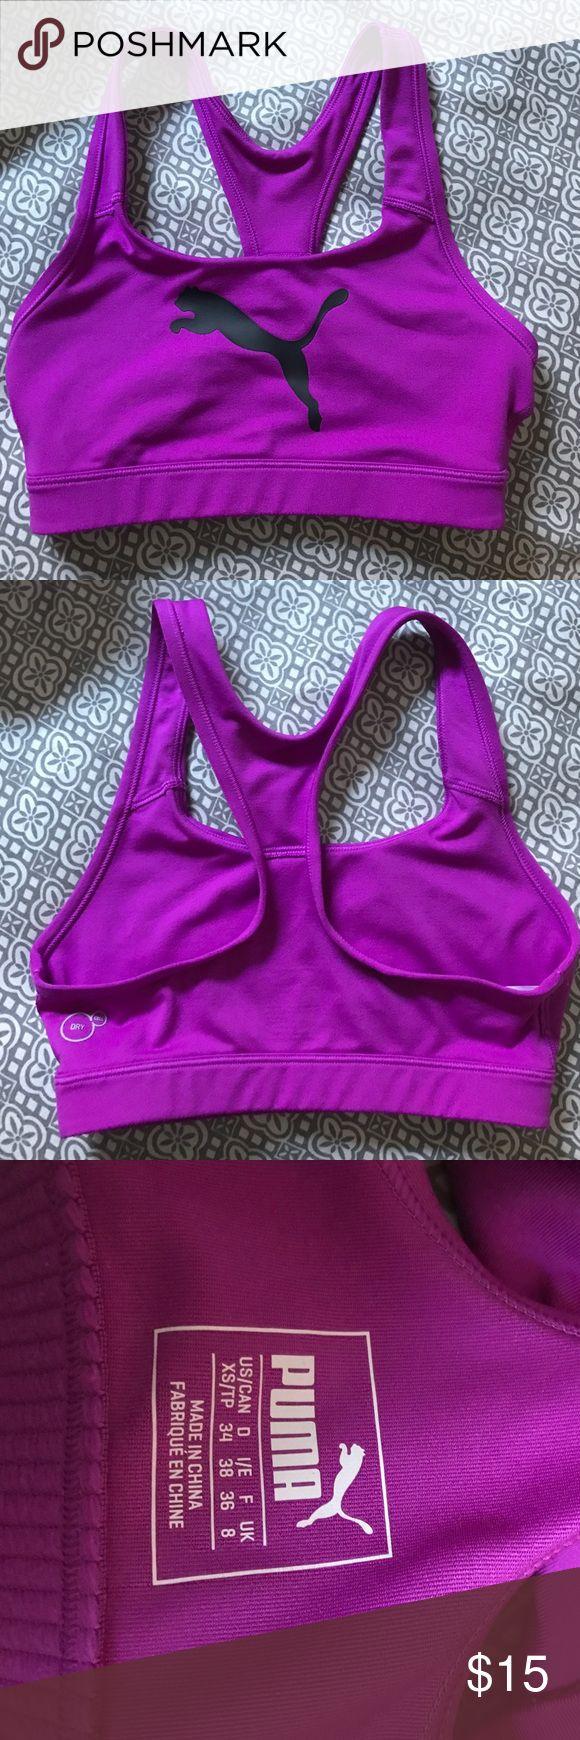 Puma Sports bra Sports bra from Puma Puma Intimates & Sleepwear Bras